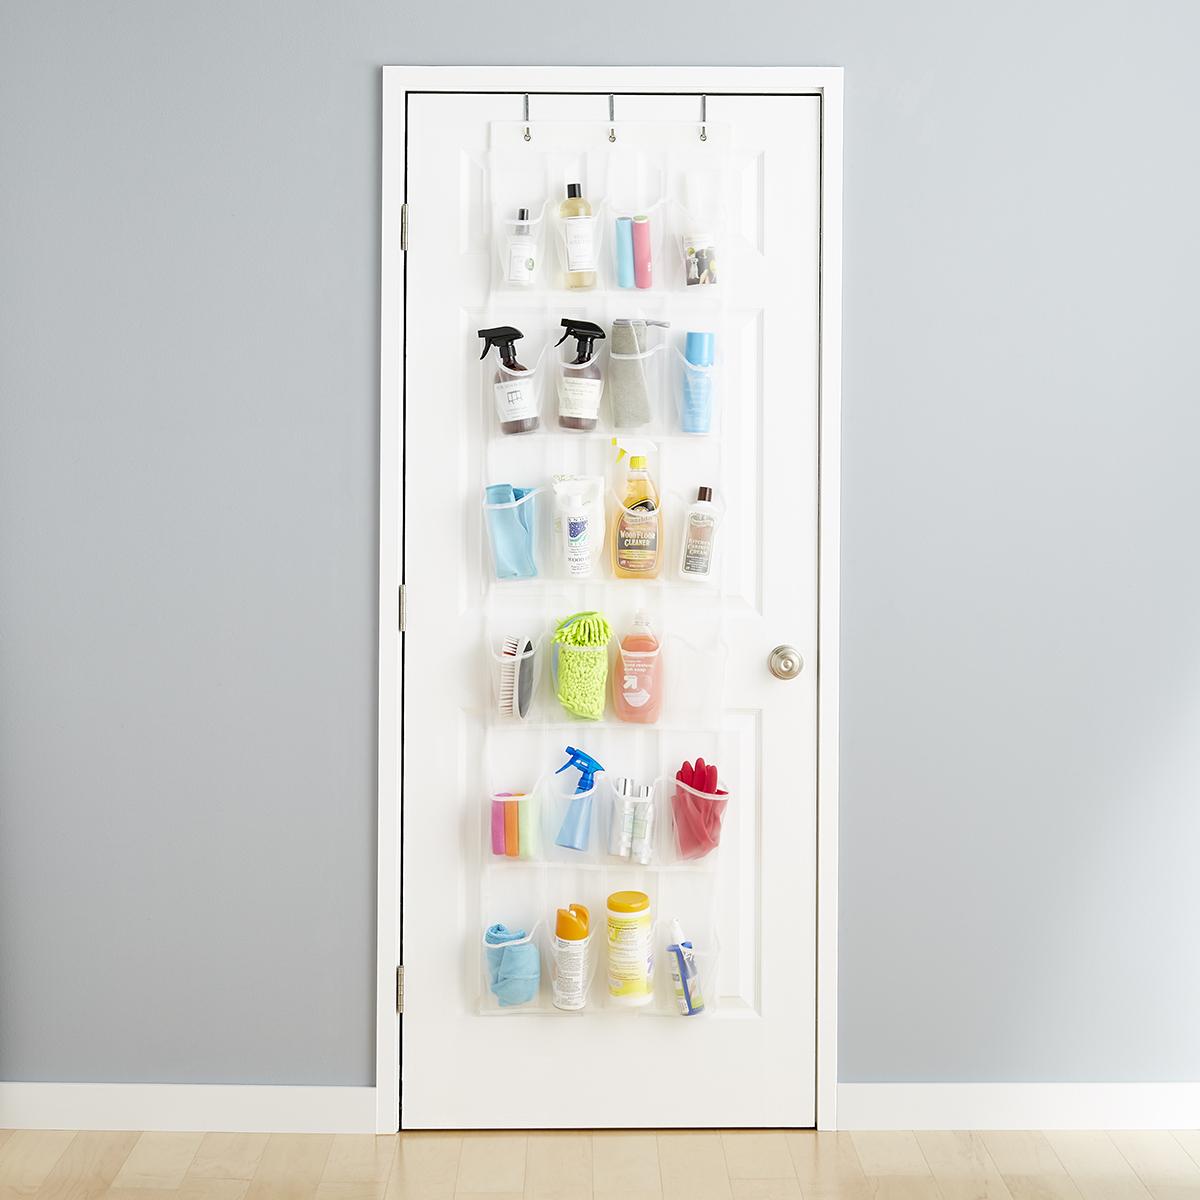 24-Pocket Mesh Over the Door Shoe Bag & 24-Pocket Mesh Over the Door Shoe Bag | The Container Store Pezcame.Com